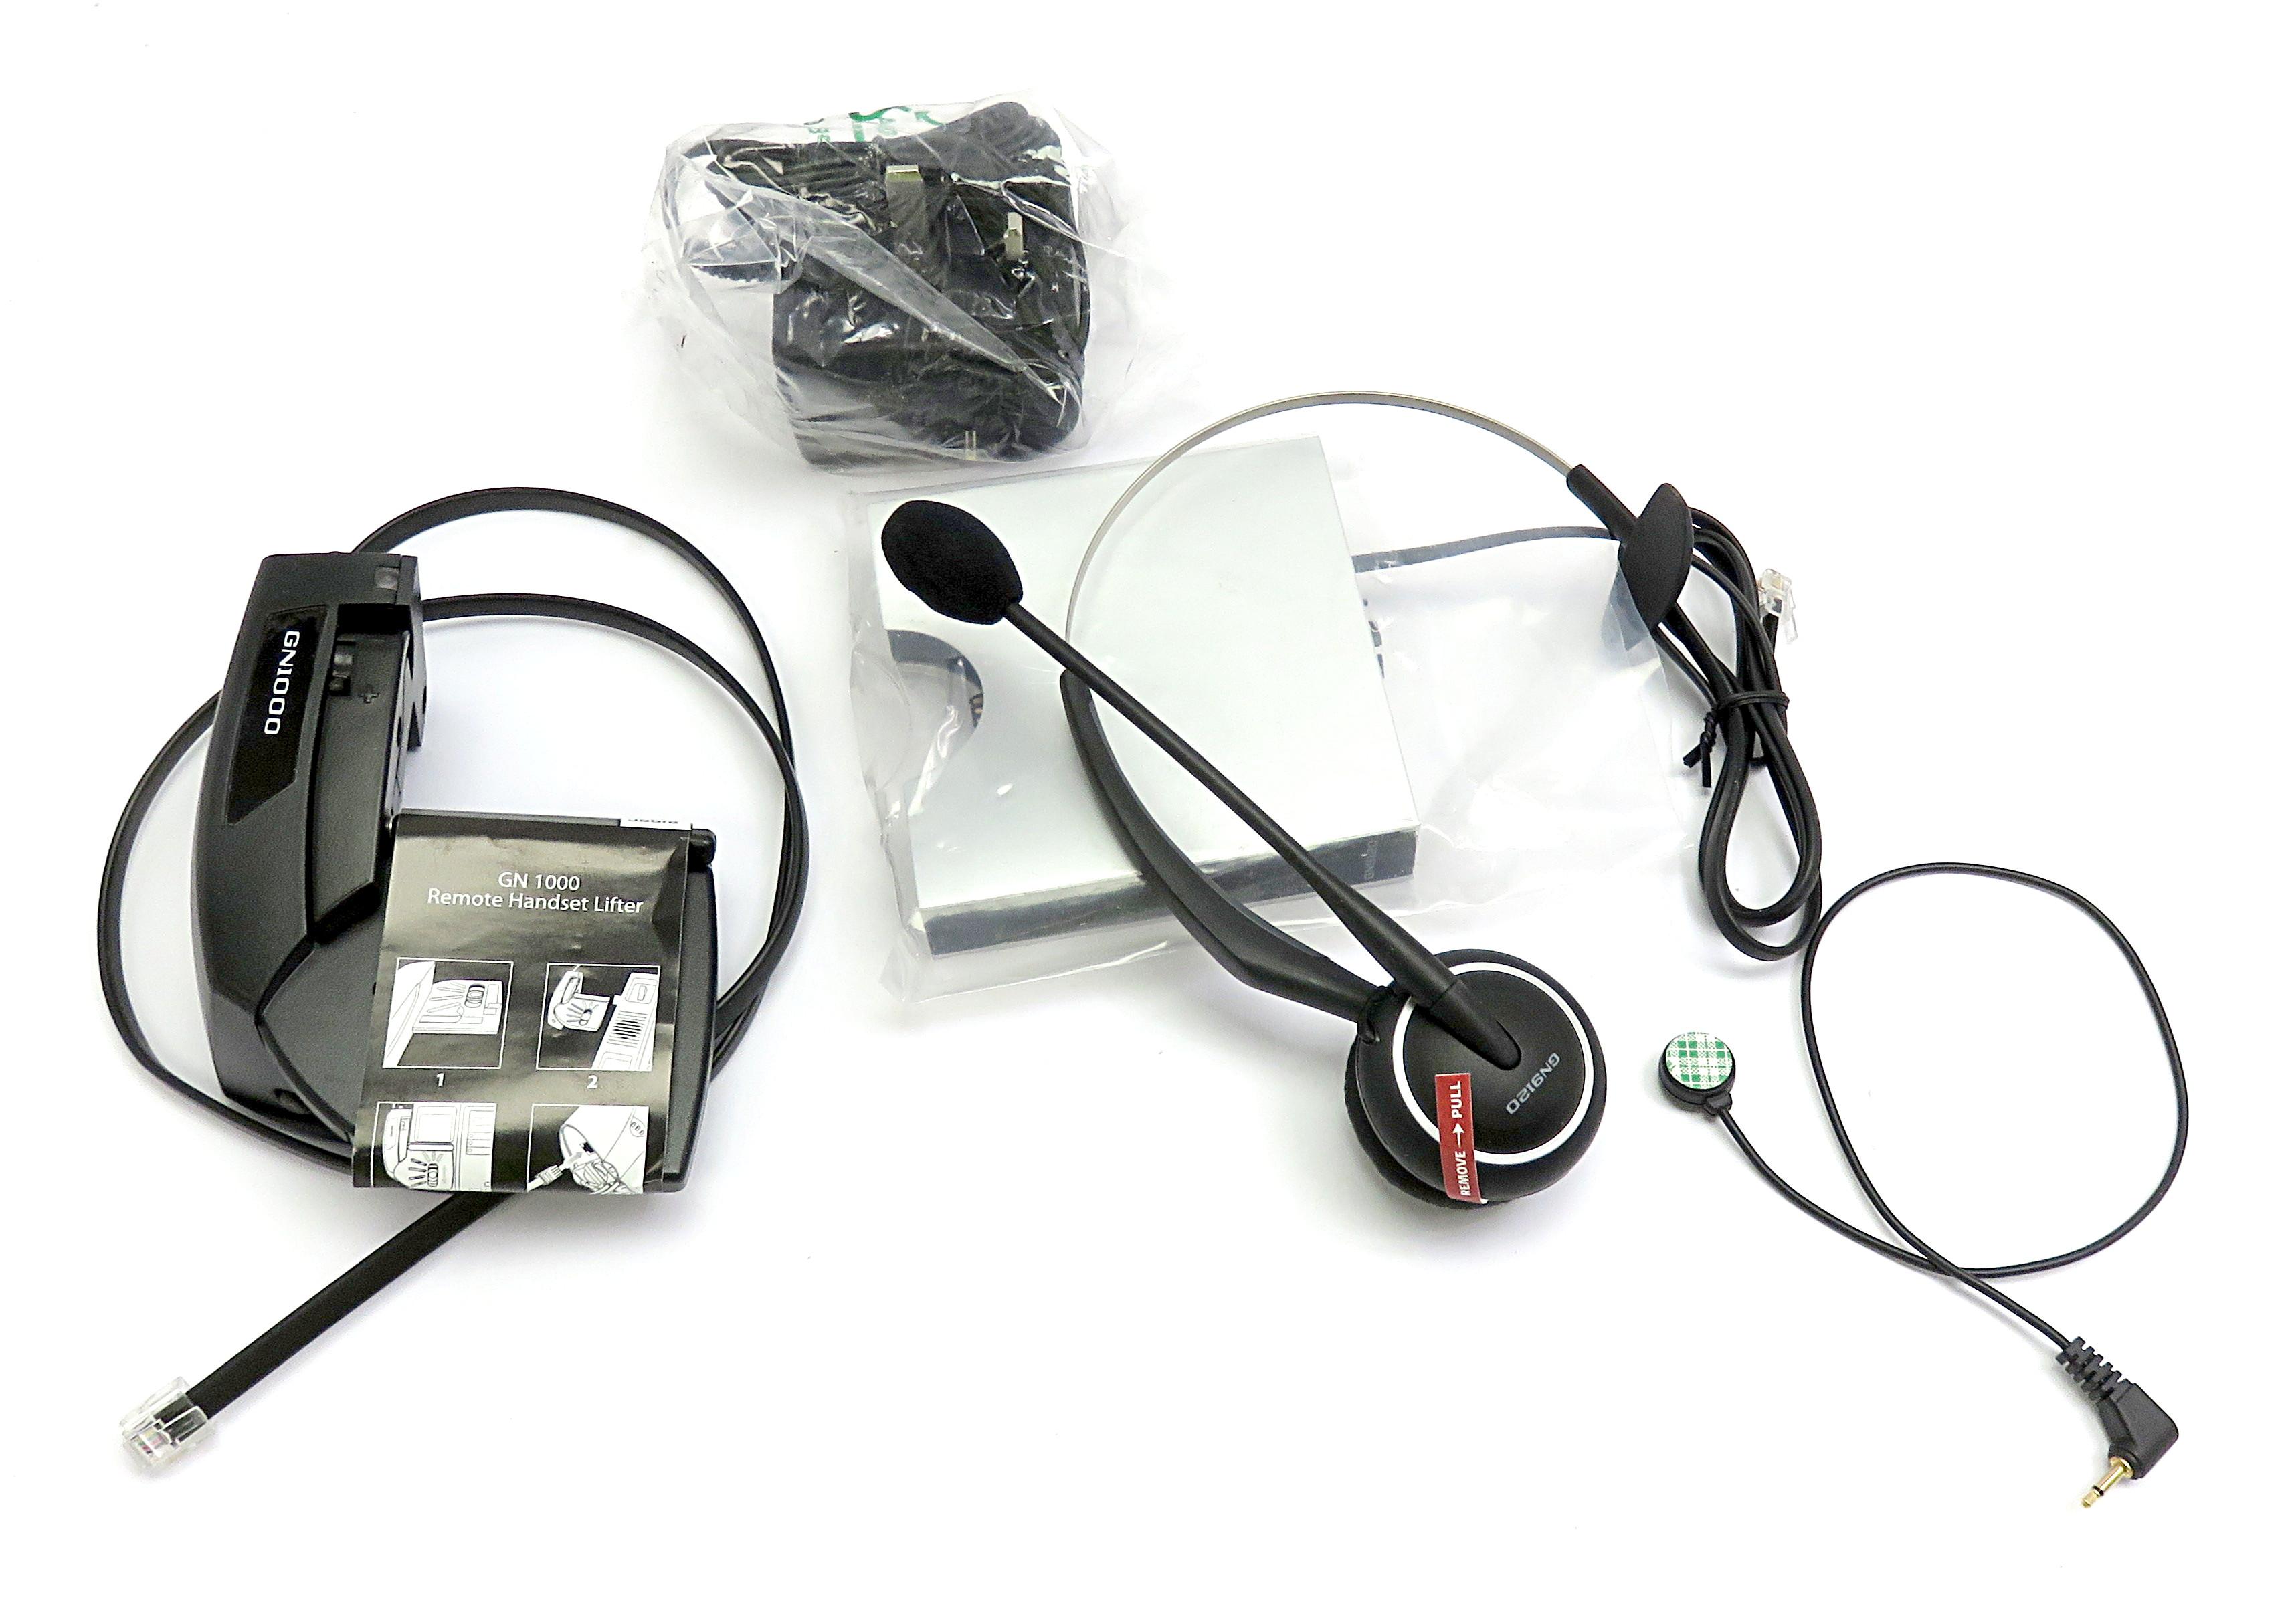 GN Netcom GB 9120 Wireless Telephony Headset System: New, No Stand